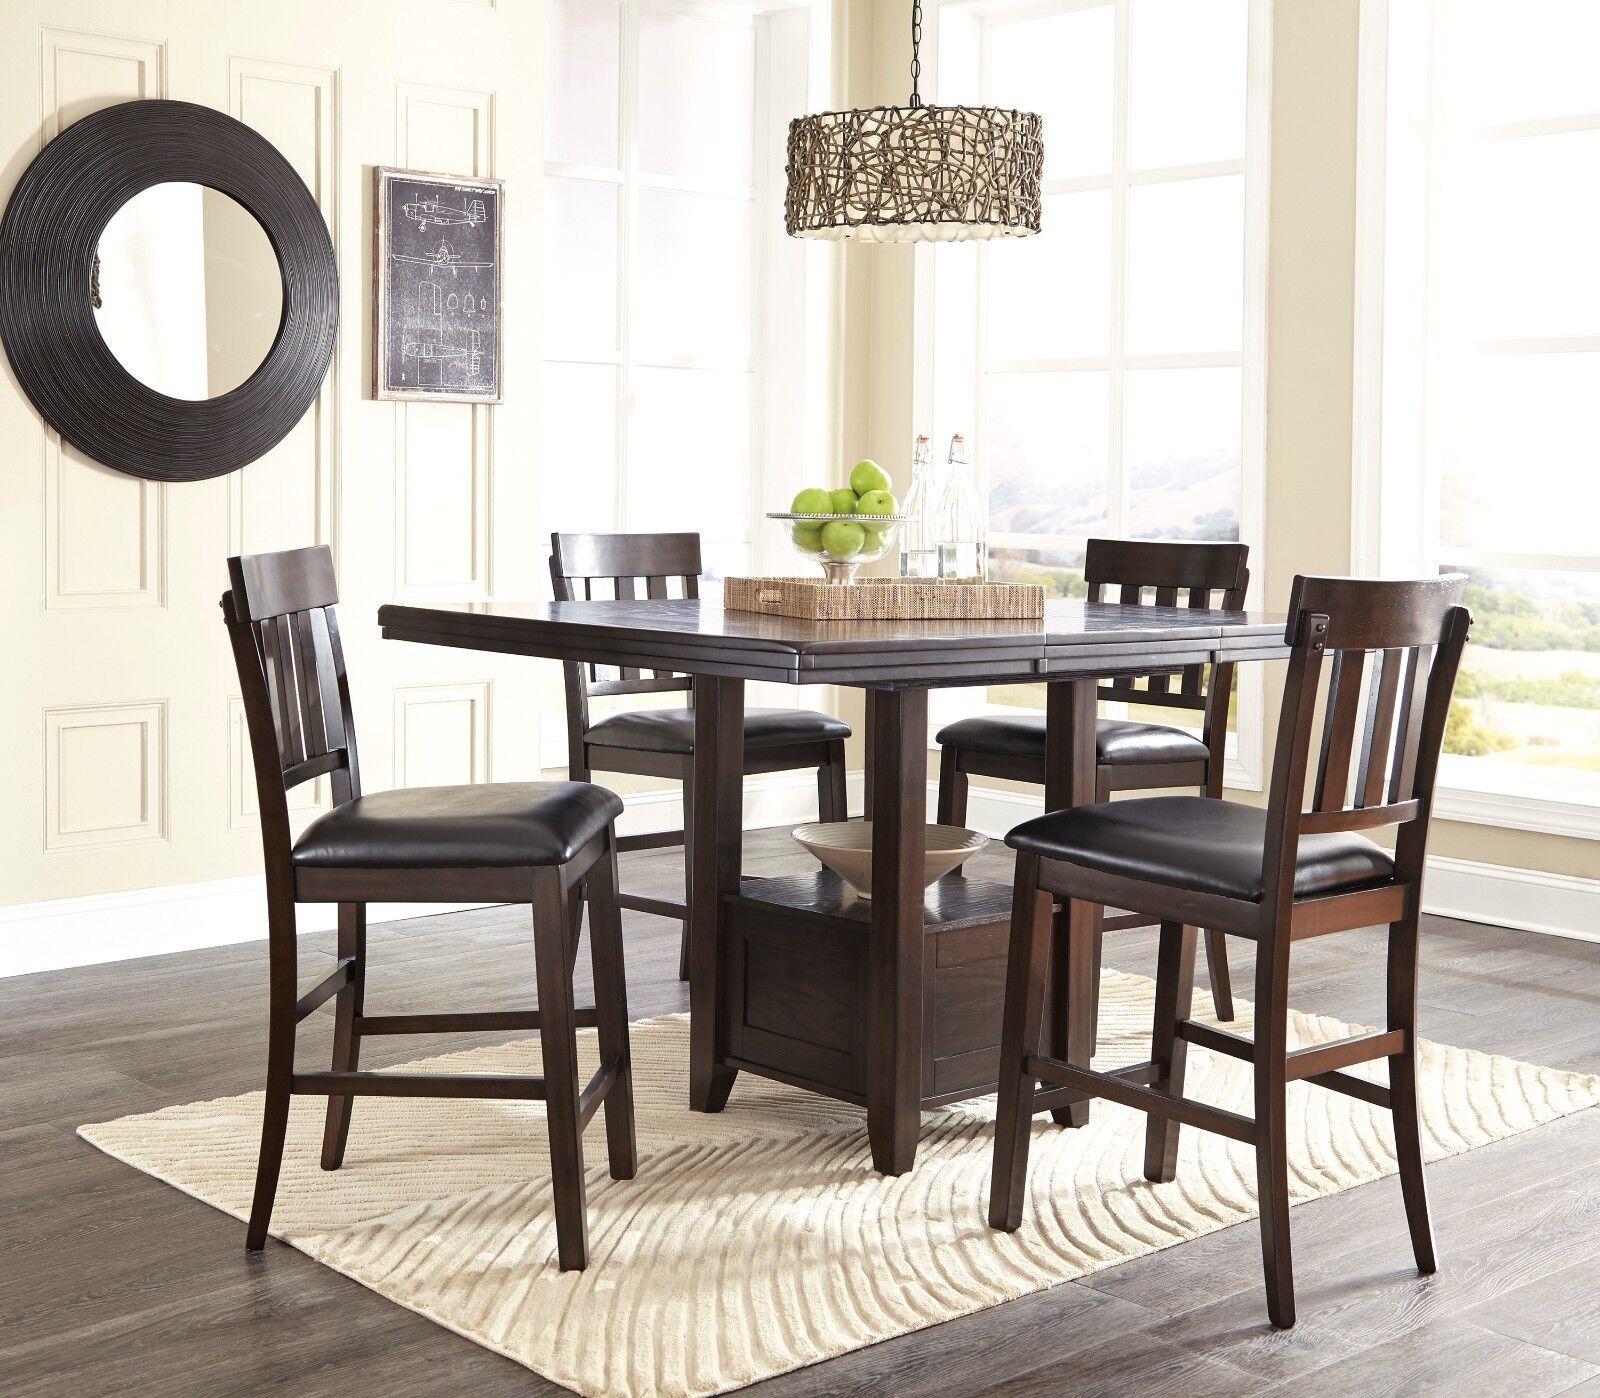 Ashley Furniture Haddington 5 Piece, Counter High Dining Room Table Sets